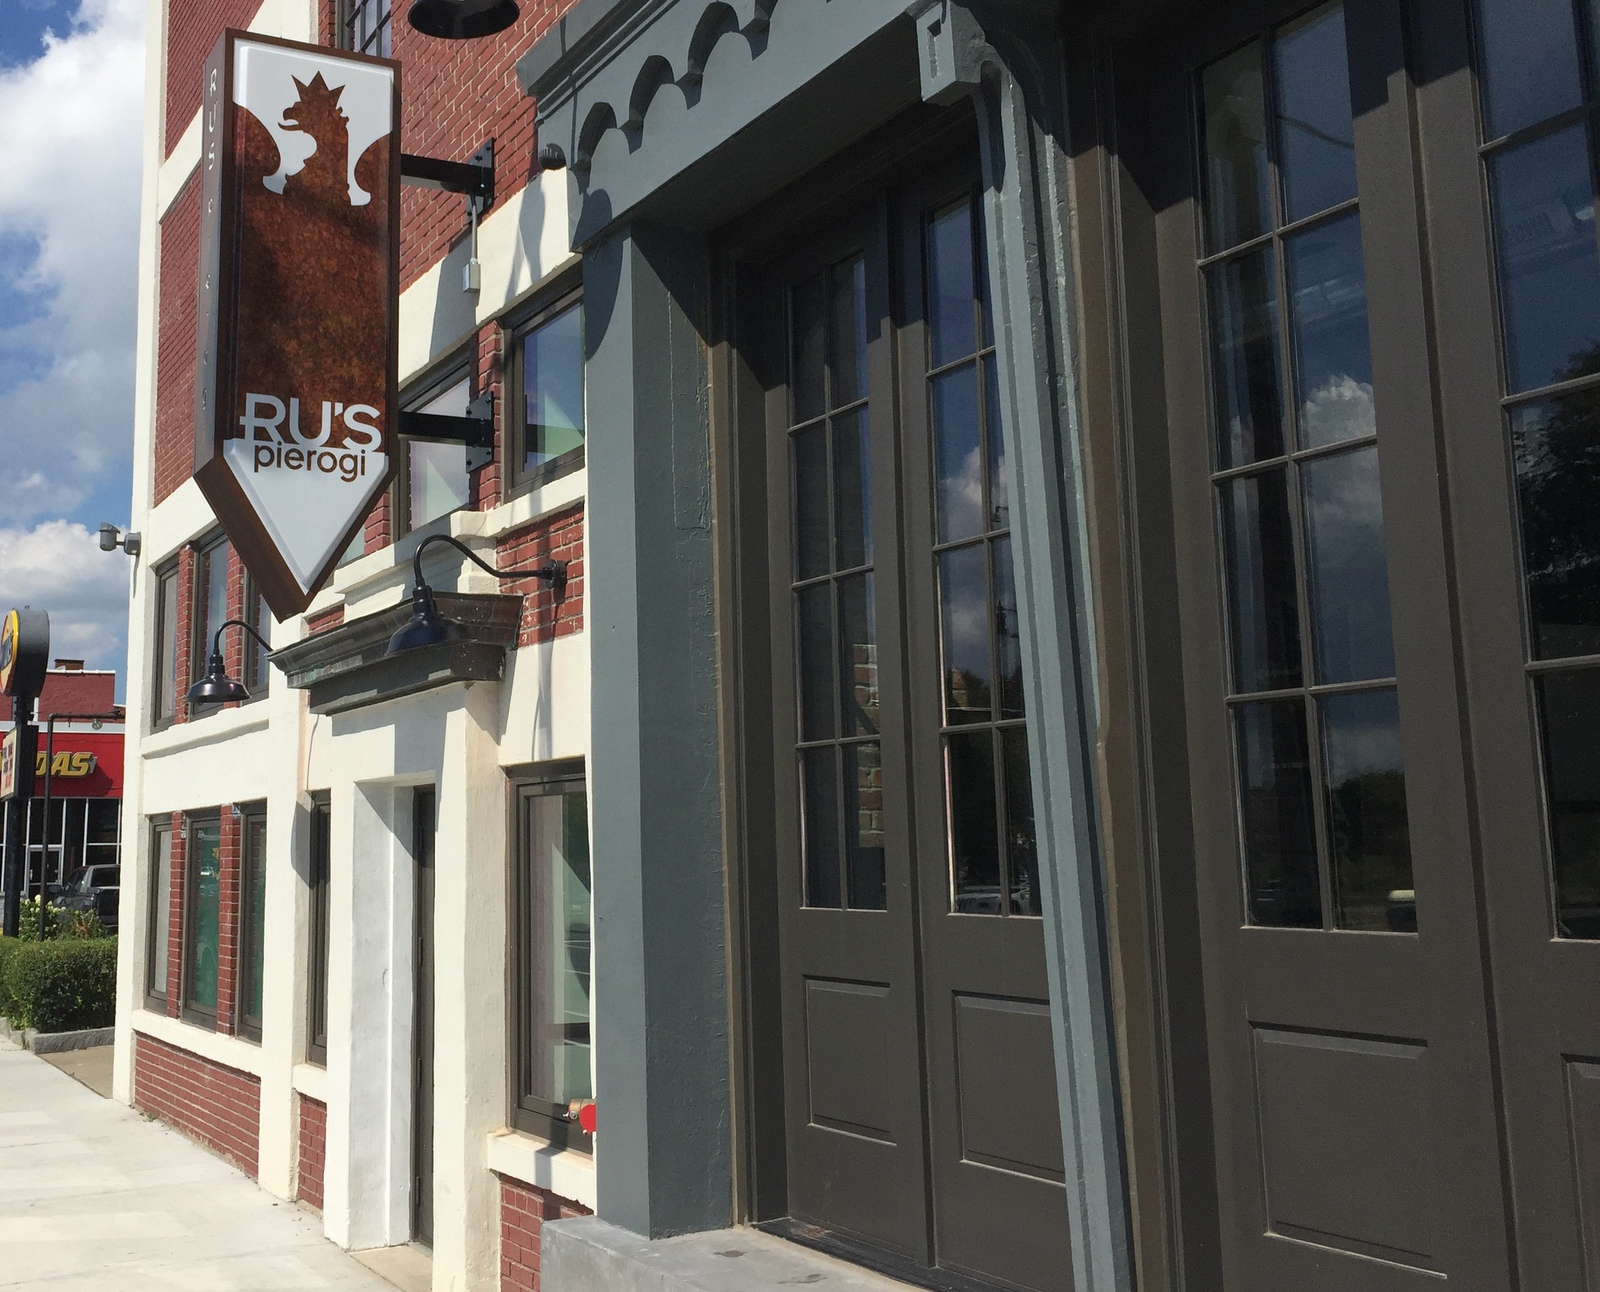 Ru's Pierogi restaurant expects to open at 295 Niagara St. in early October. (Andrew Galarneau/Buffalo News)